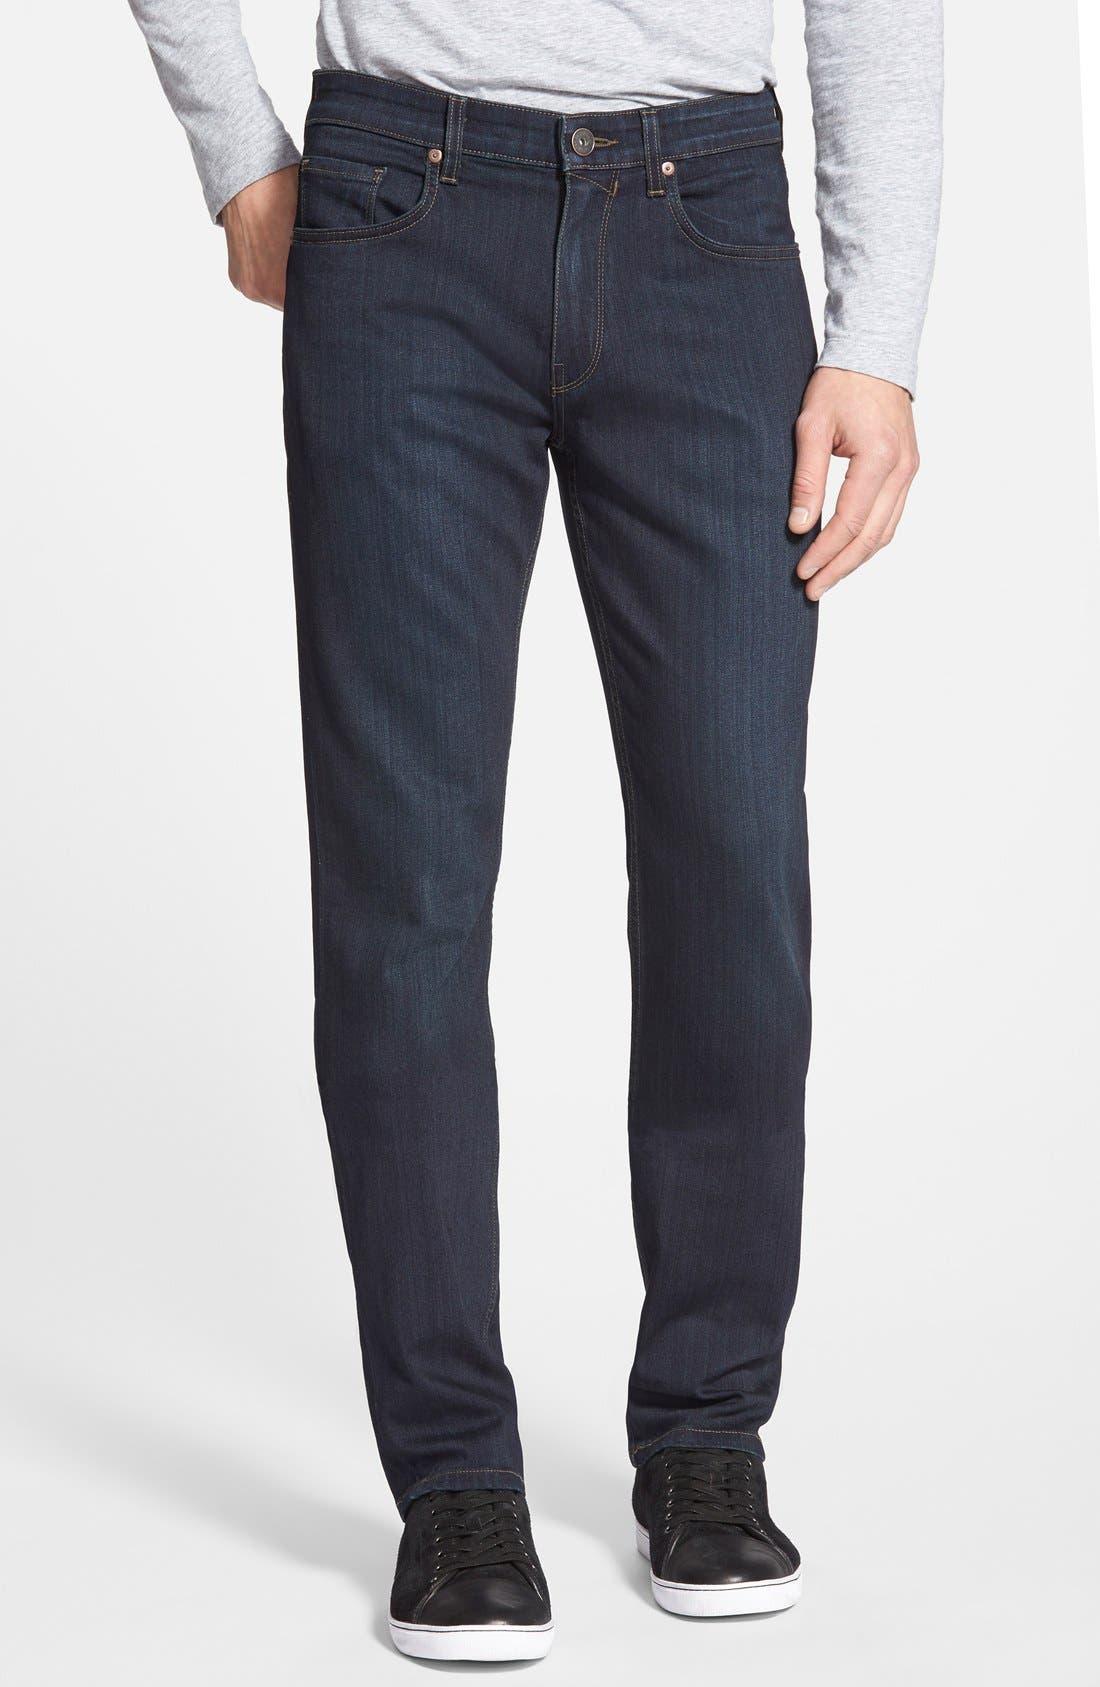 PAIGE Transcend - Federal XL Slim Straight Leg Jeans (Cellar) (Tall)